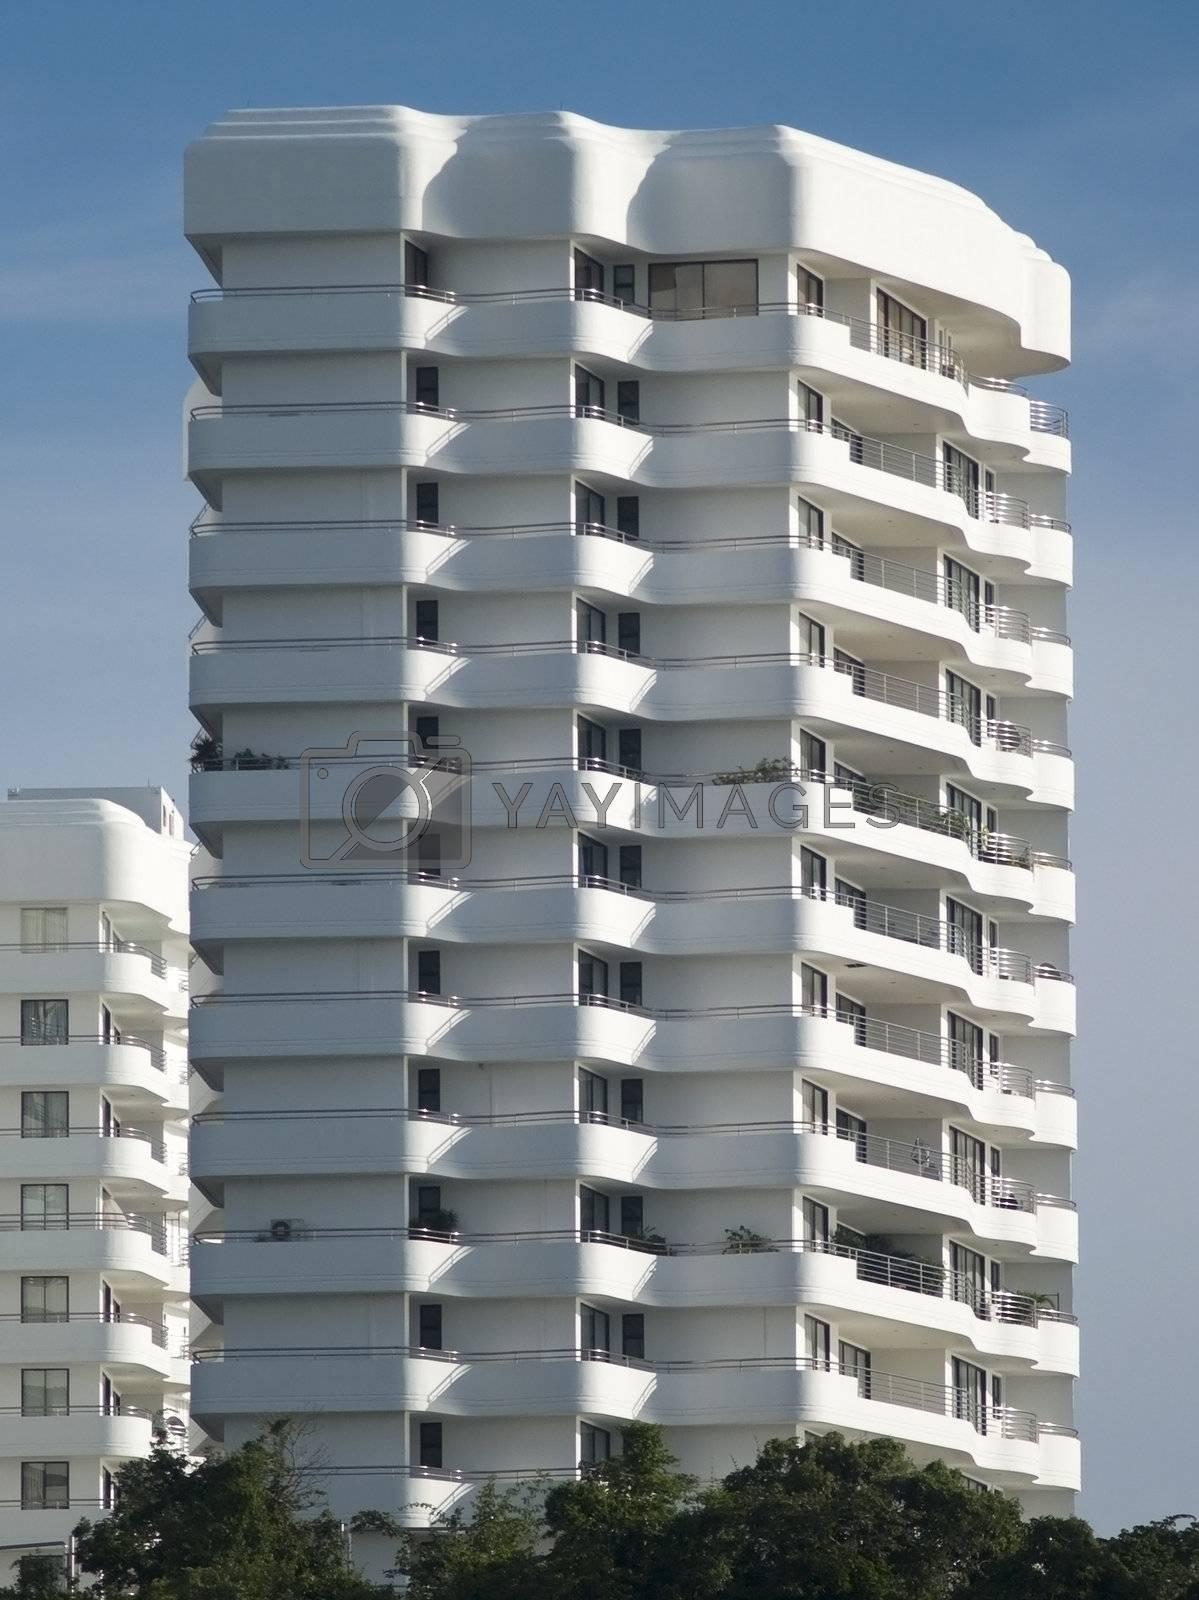 Luxury apartment building by epixx